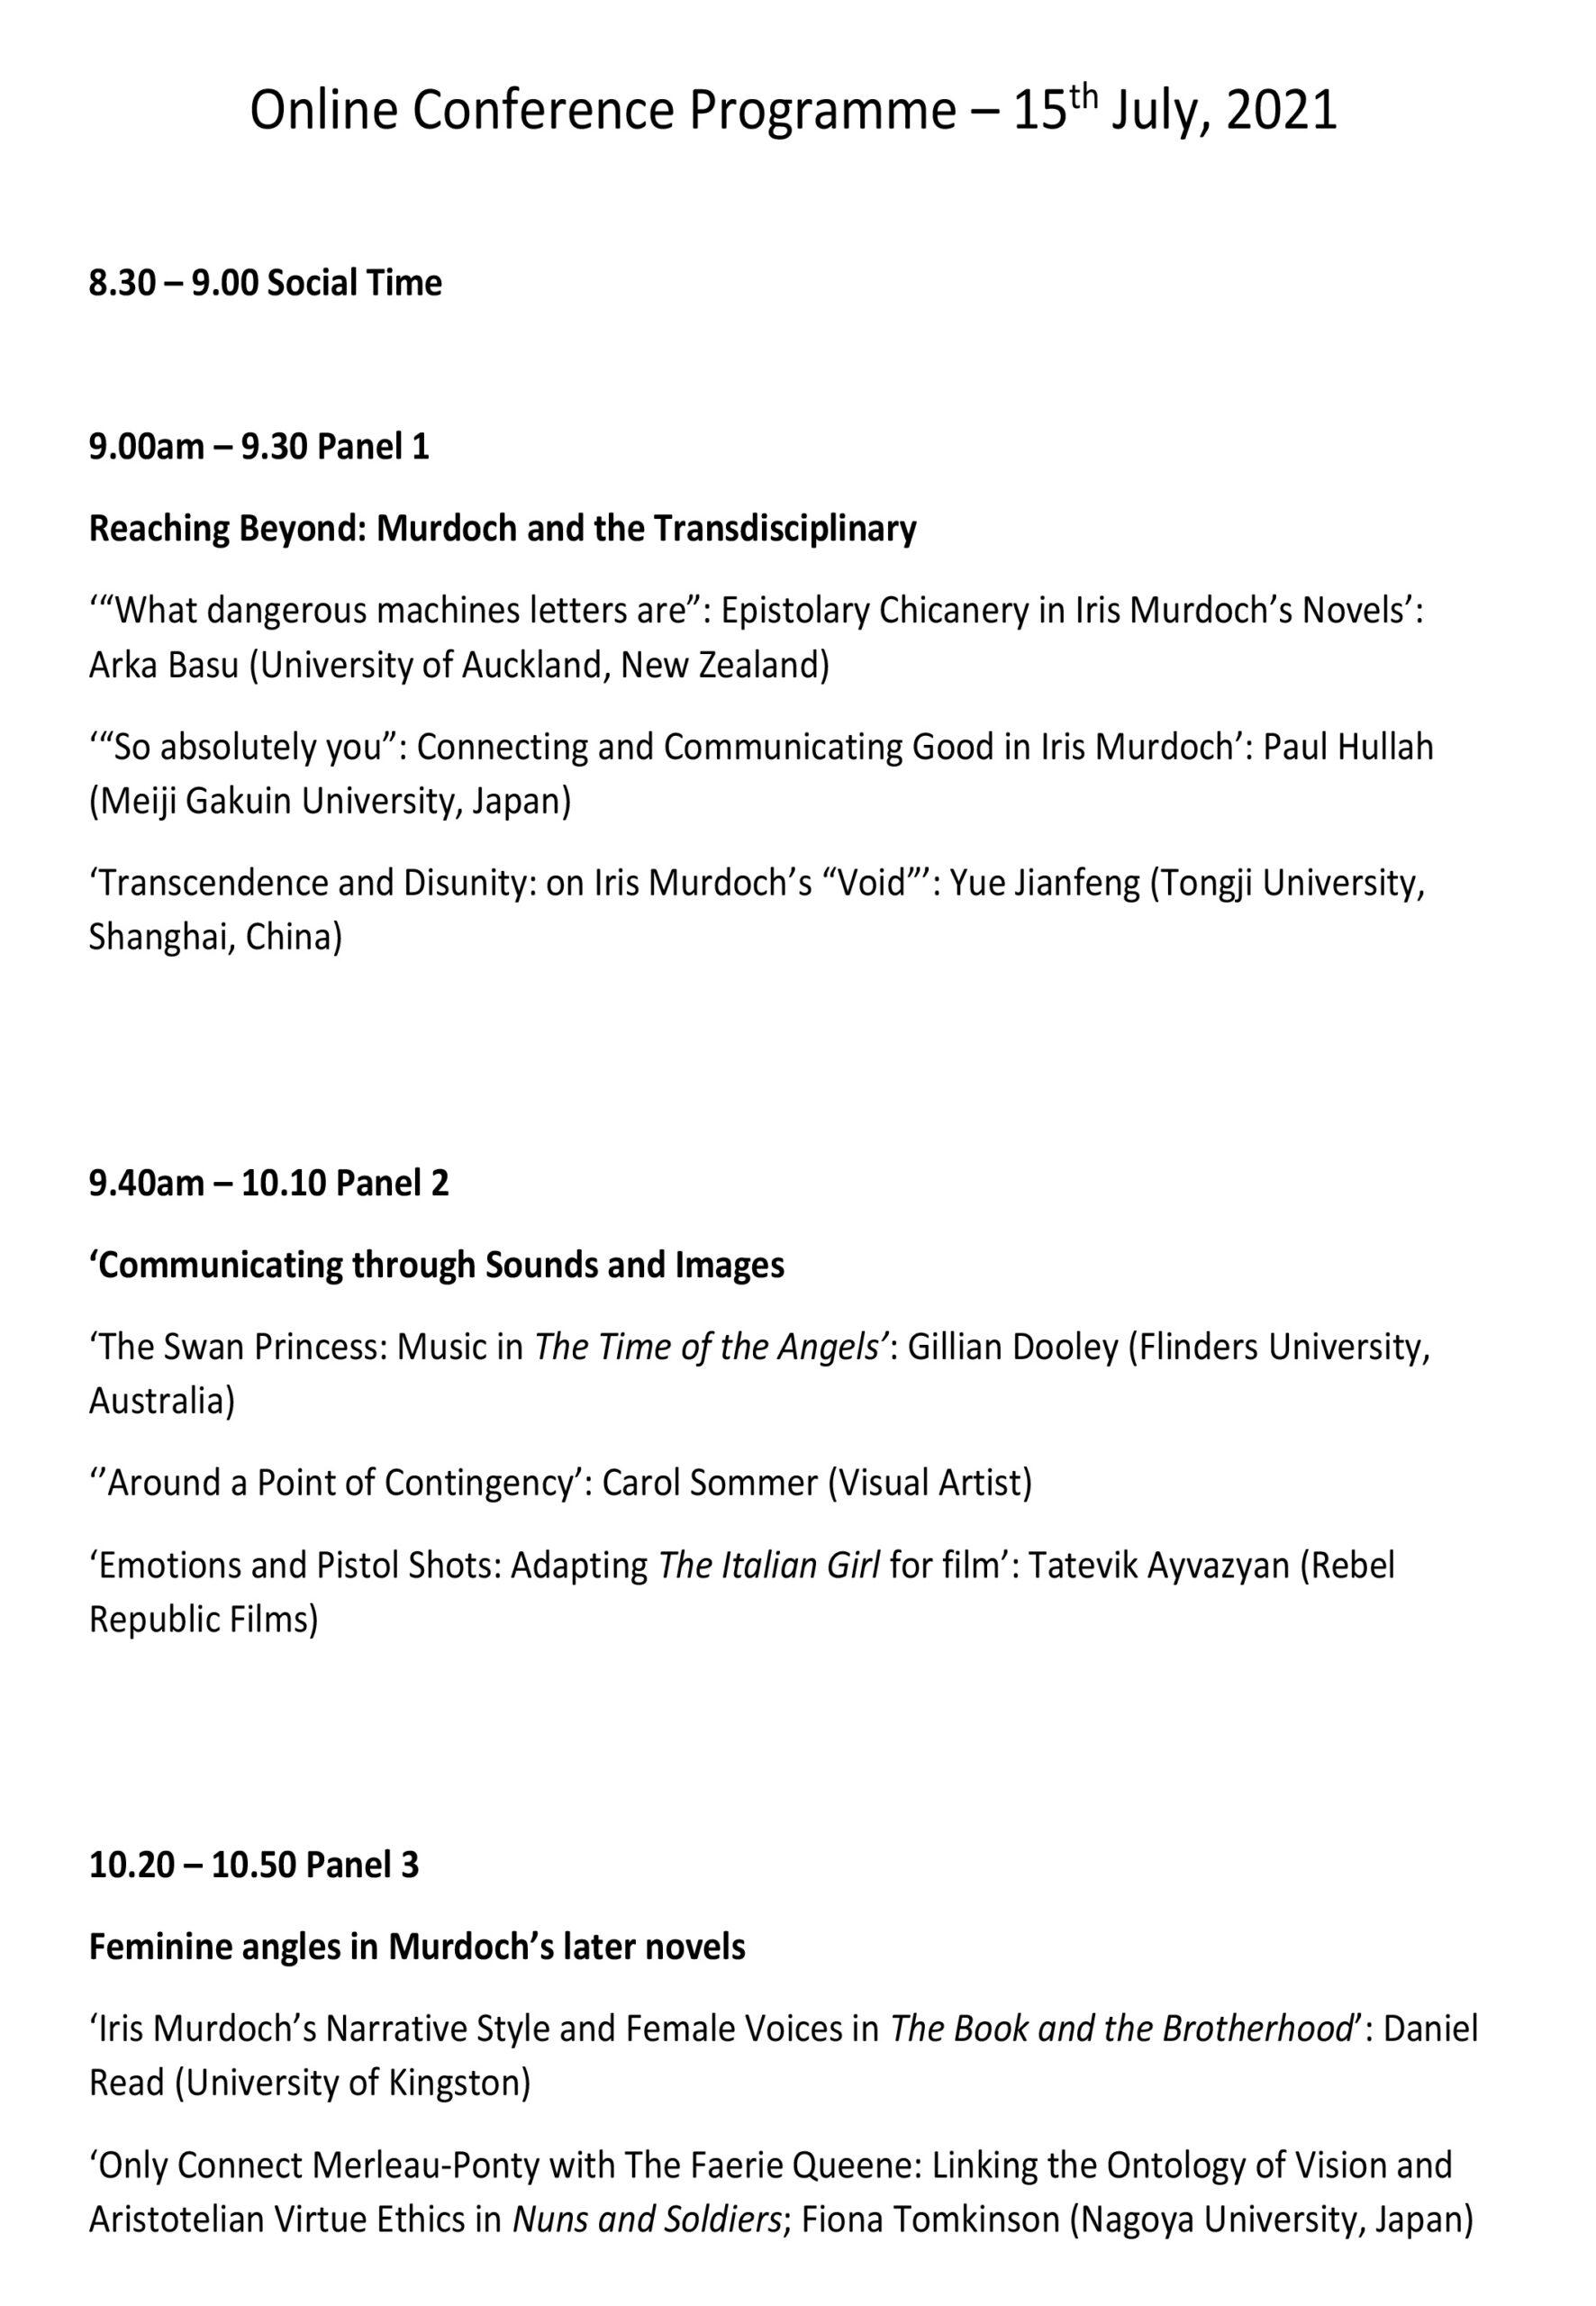 Online Conference Programme 1/3